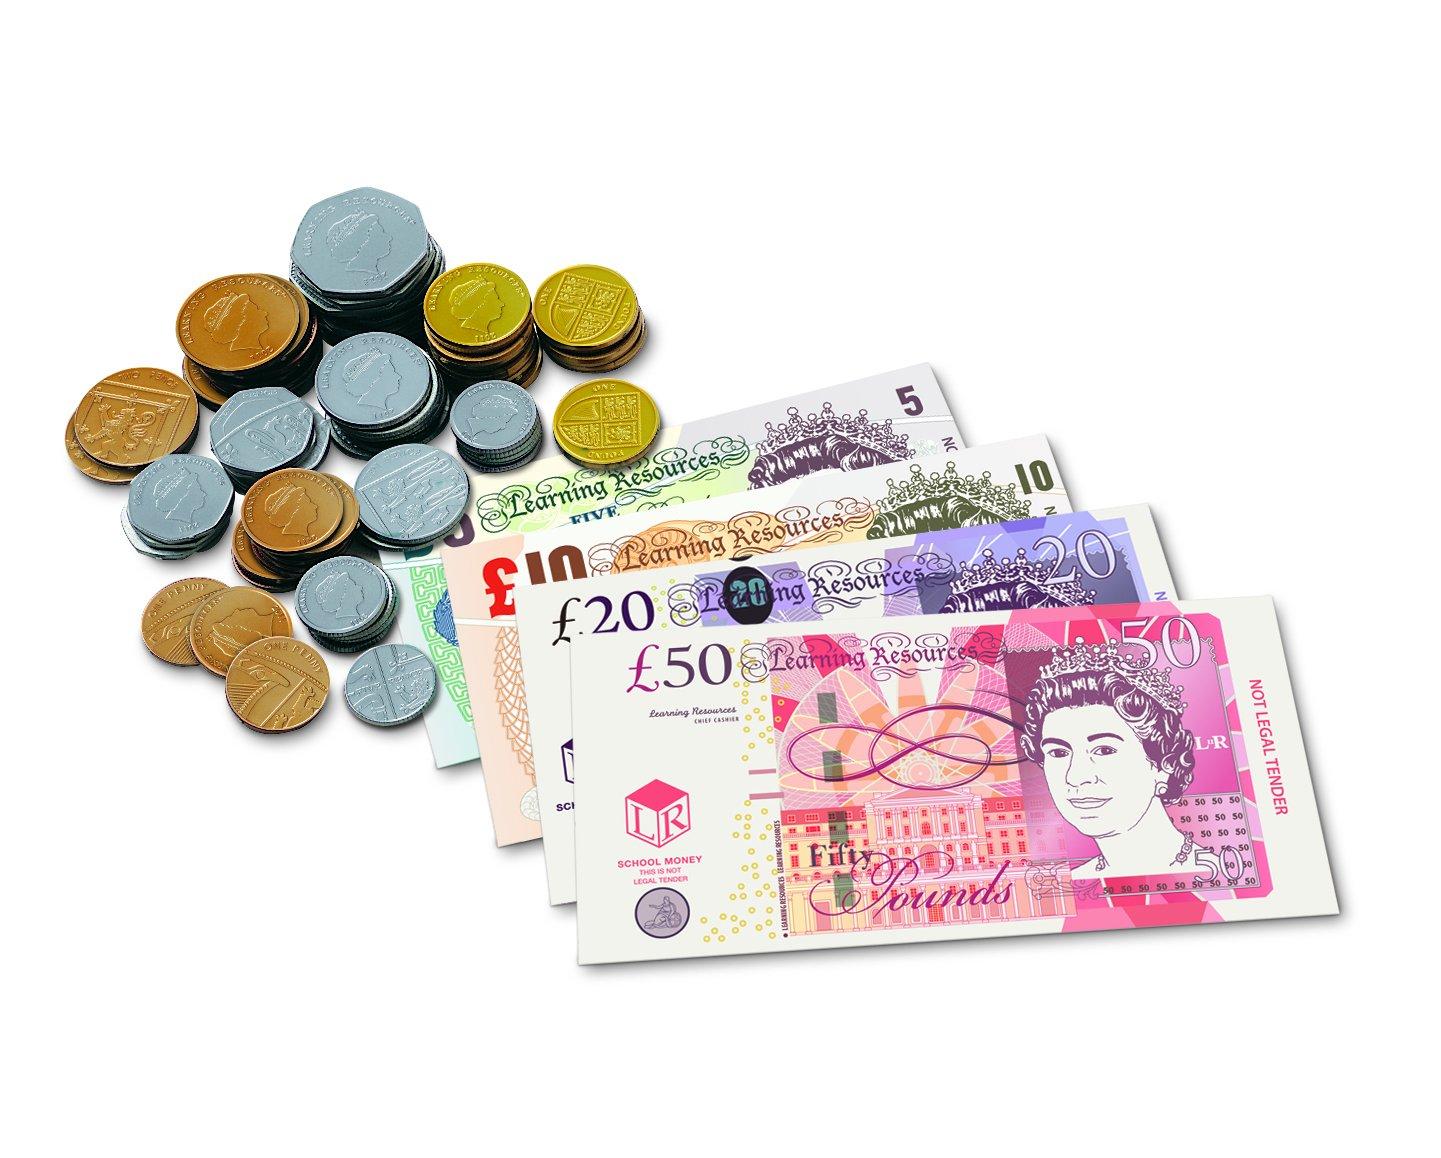 Toy Plastic Money : Play money coins eta hand mind bills and